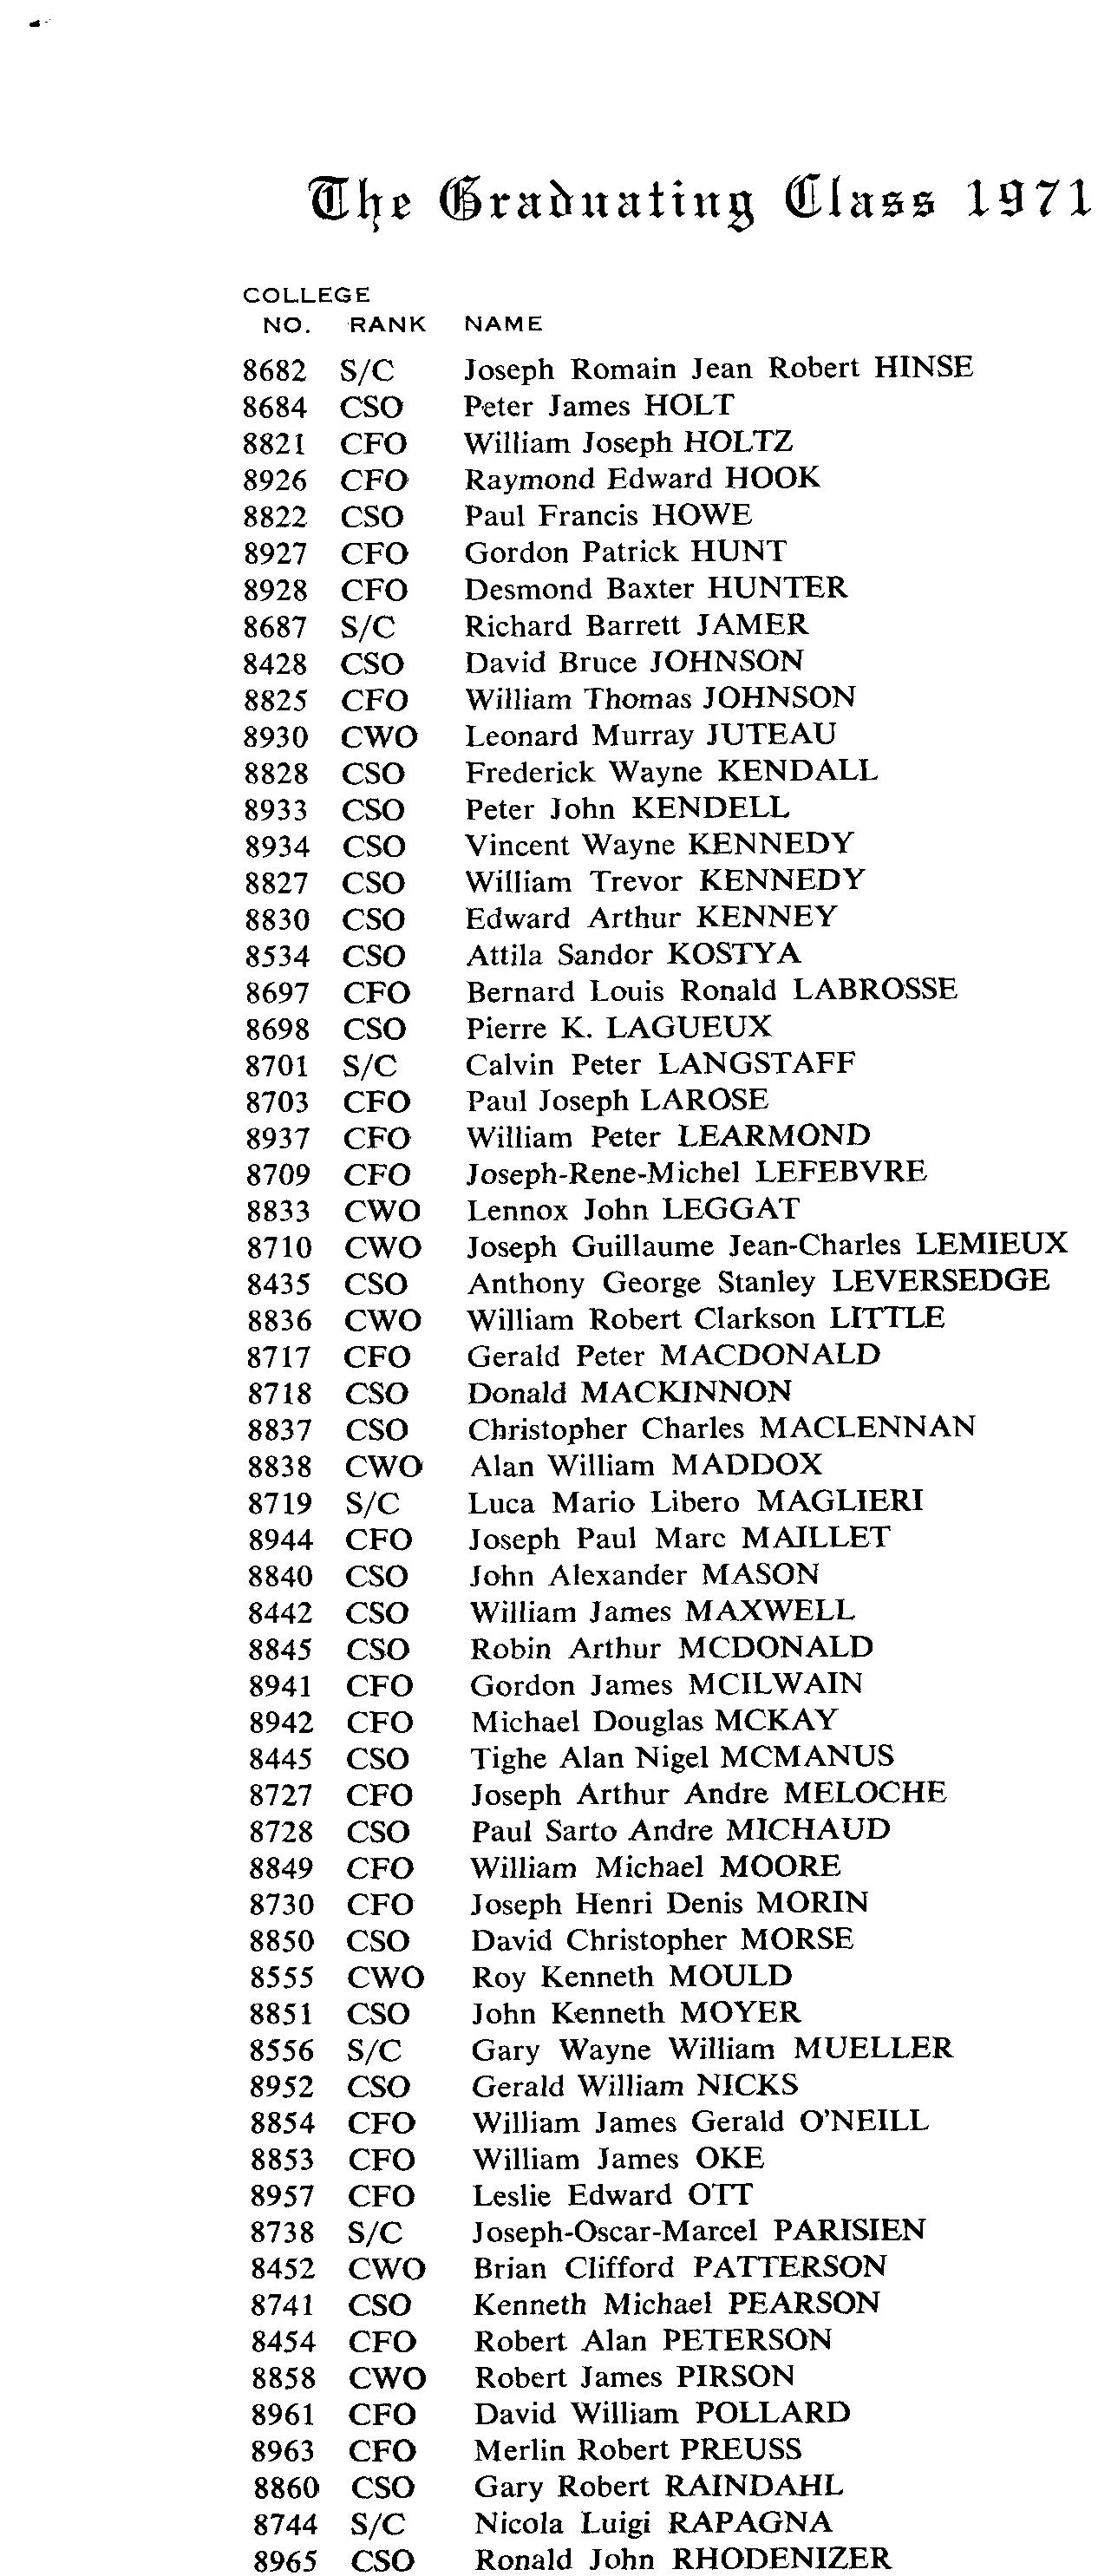 8_RMC-Graduation Ceremonies-22 May 1971-P5